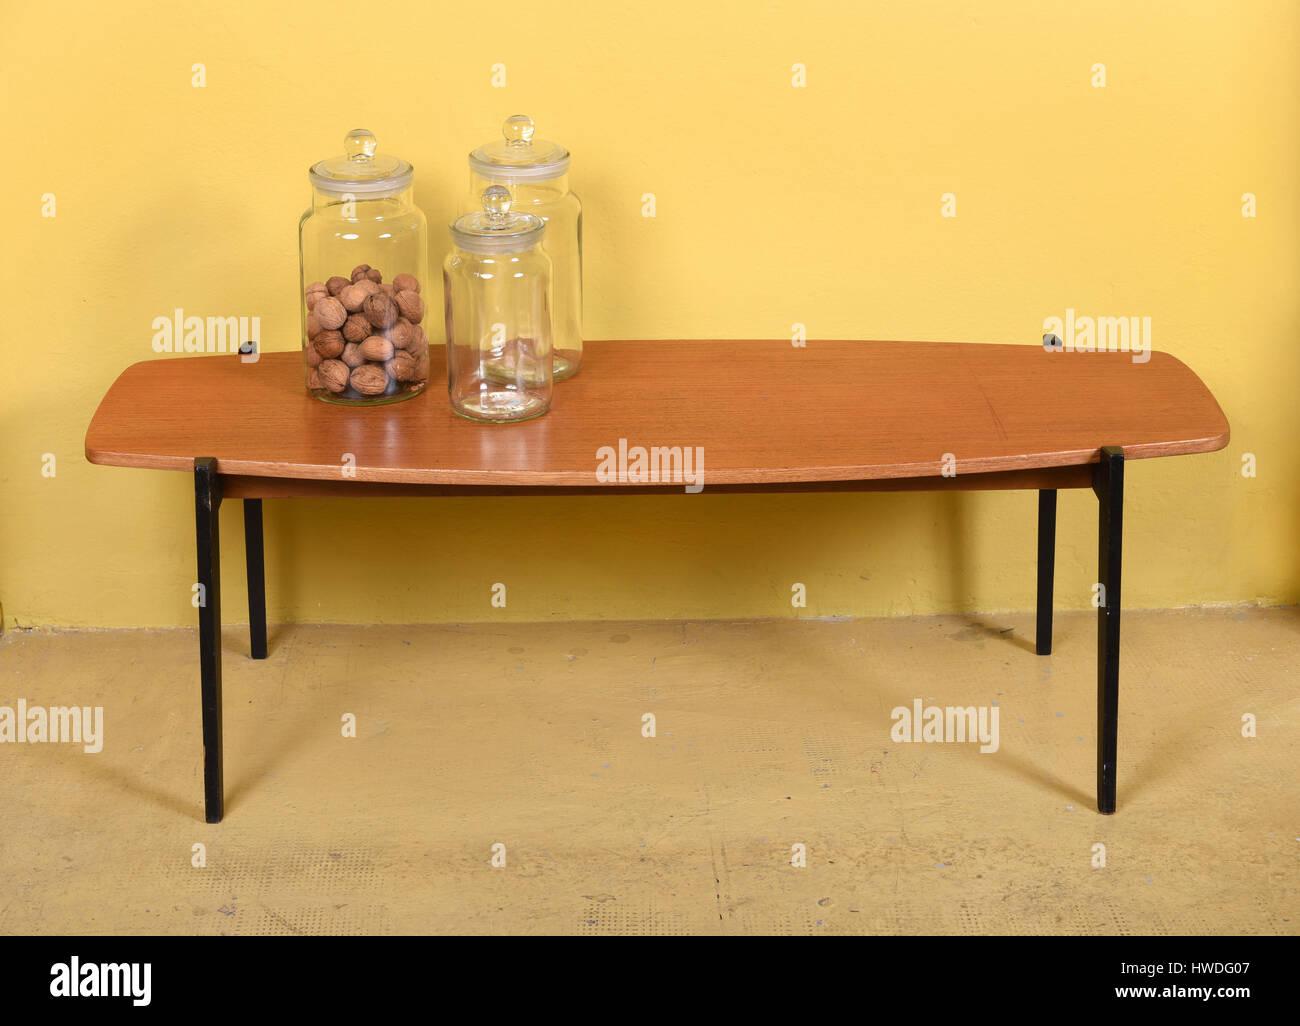 Excepcional Turcas Para Muebles Mesas De Café Viñeta - Muebles Para ...